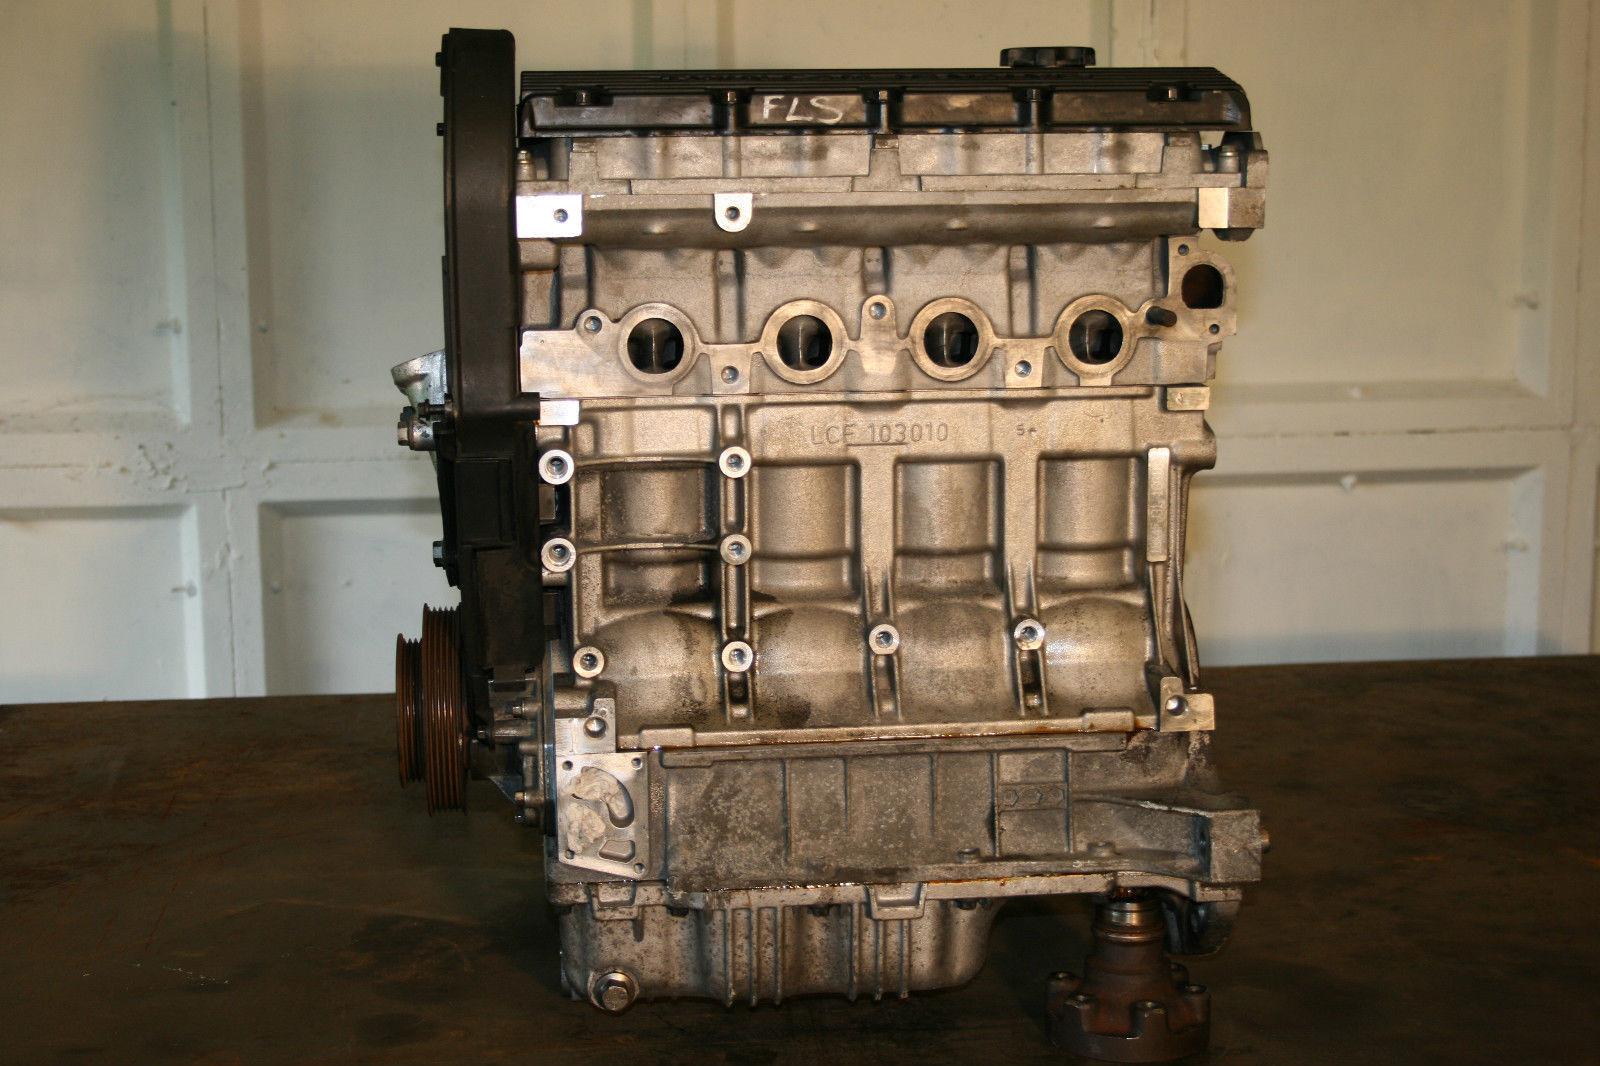 rover k series reconditioned engine 1 8 litre petrol. Black Bedroom Furniture Sets. Home Design Ideas